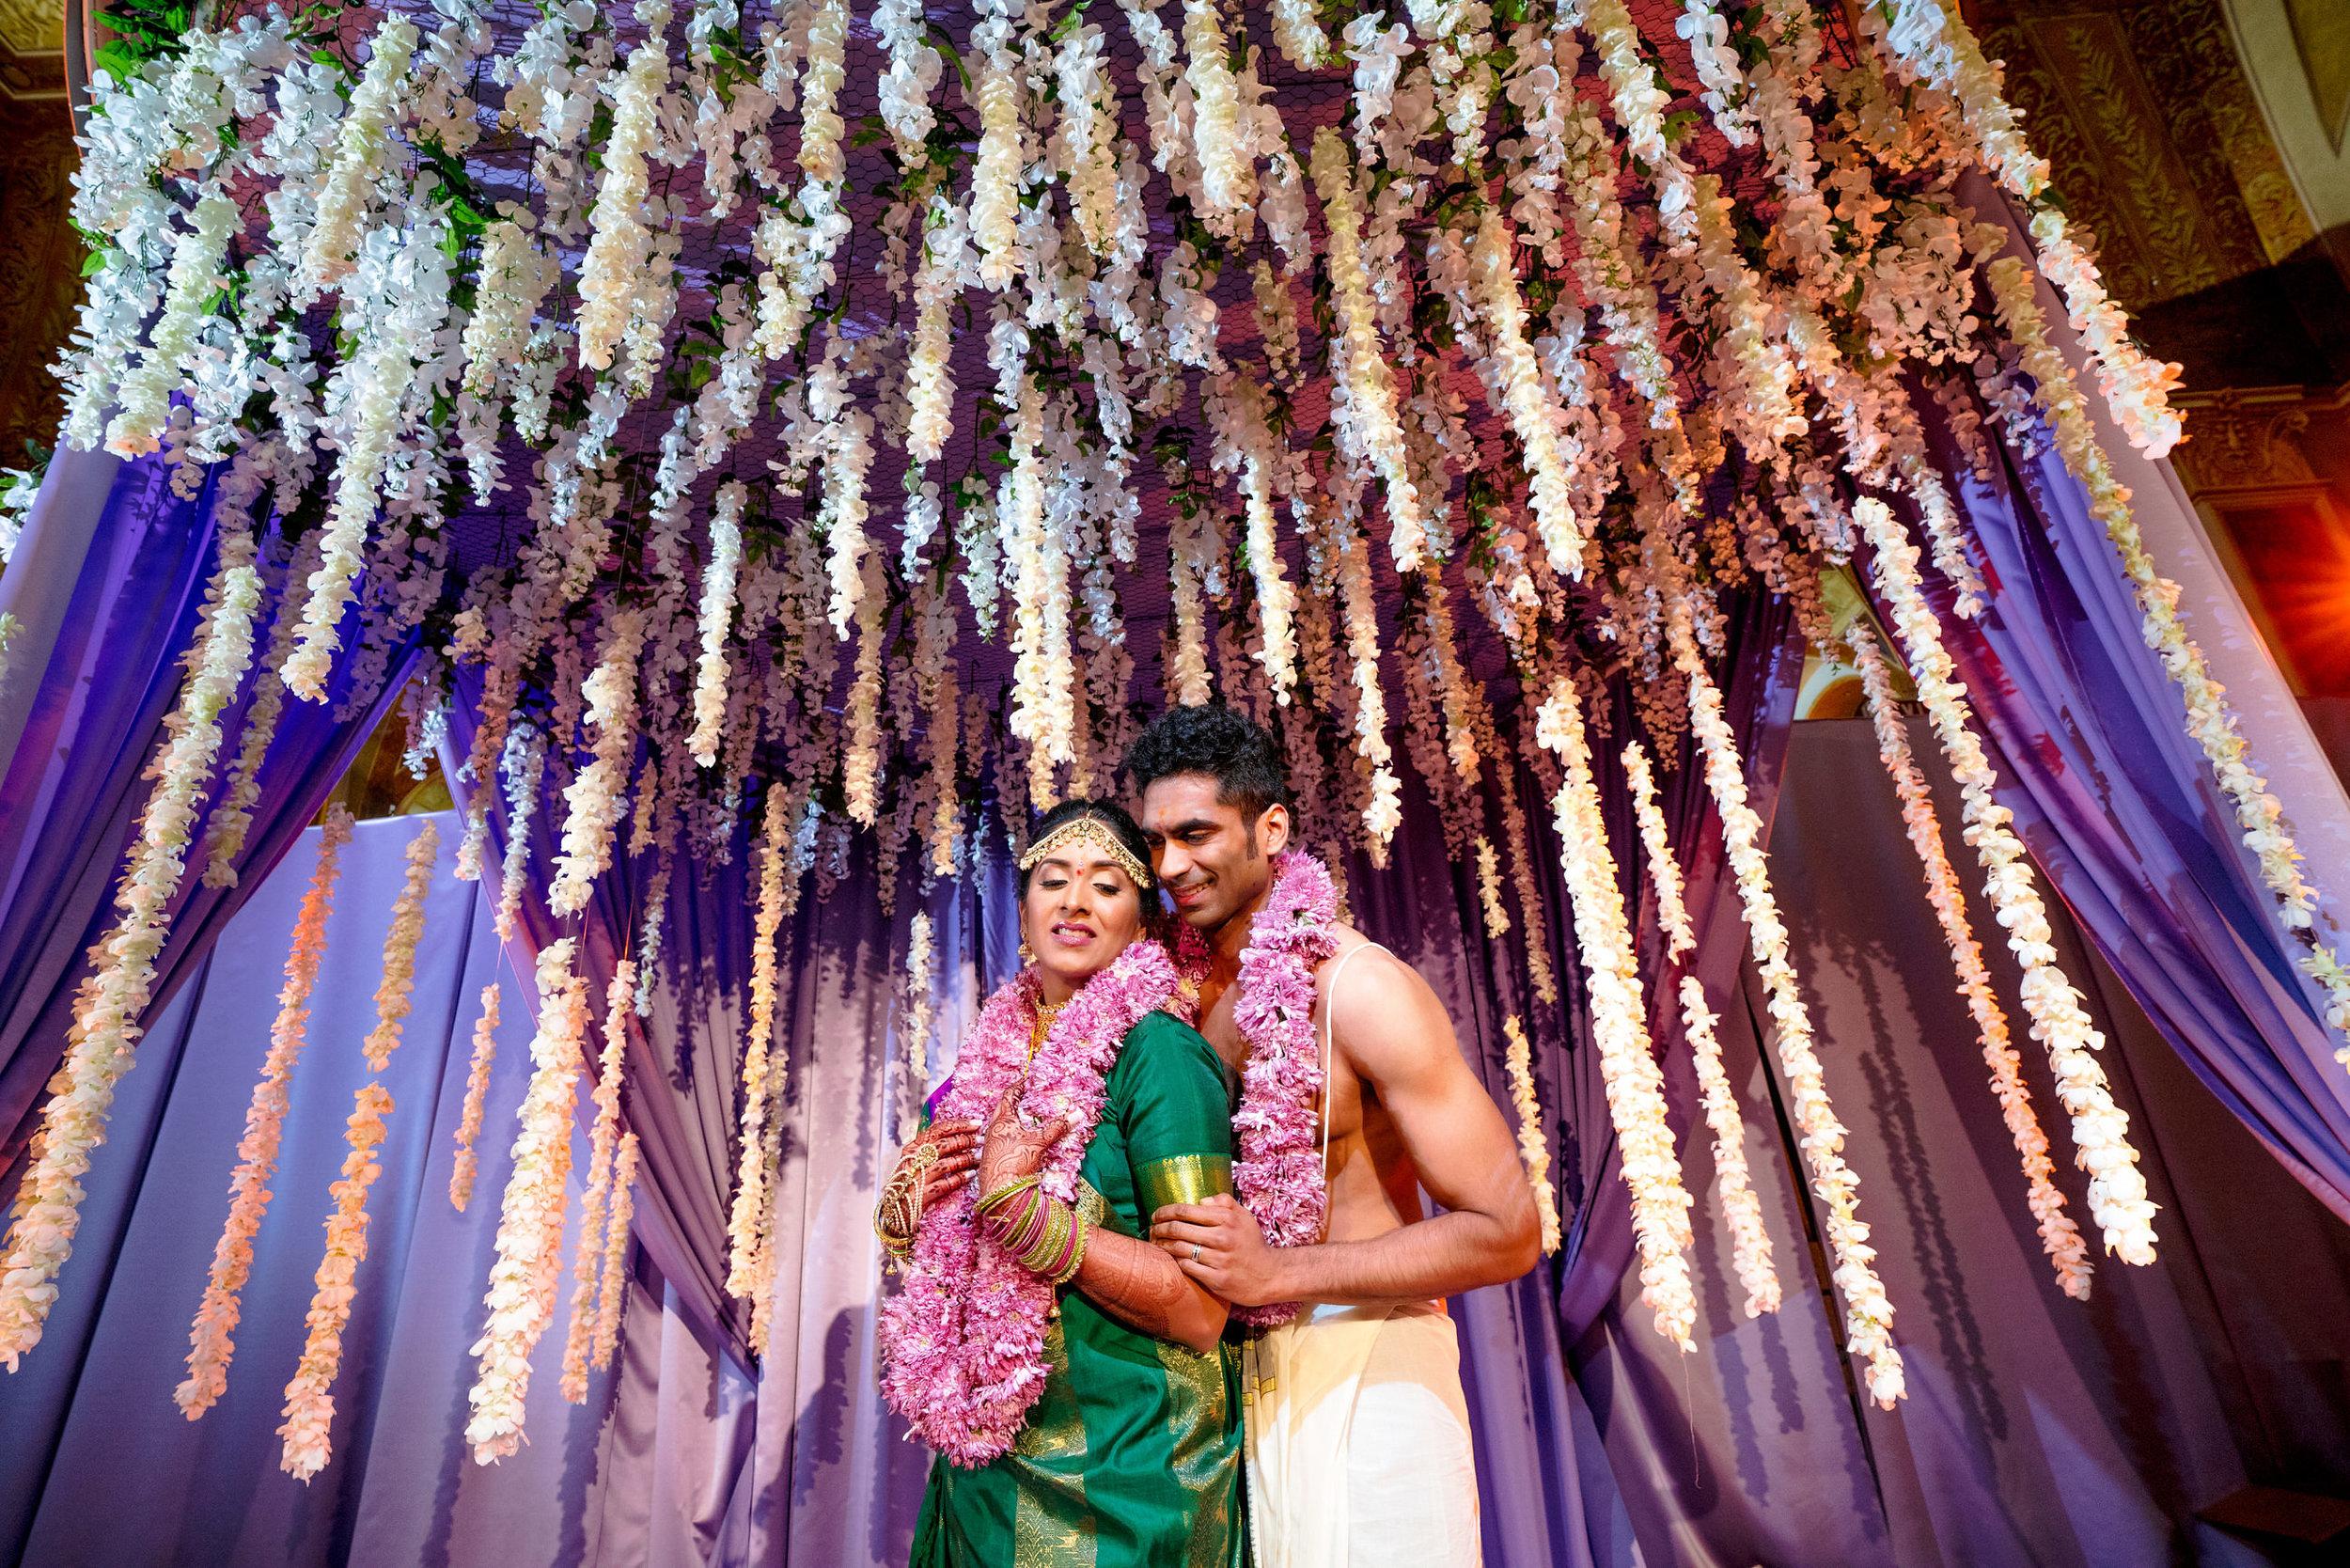 INDIAN WEDDING BRIDE AND GROOM CEREMONY FLOWER ALTER.JPG